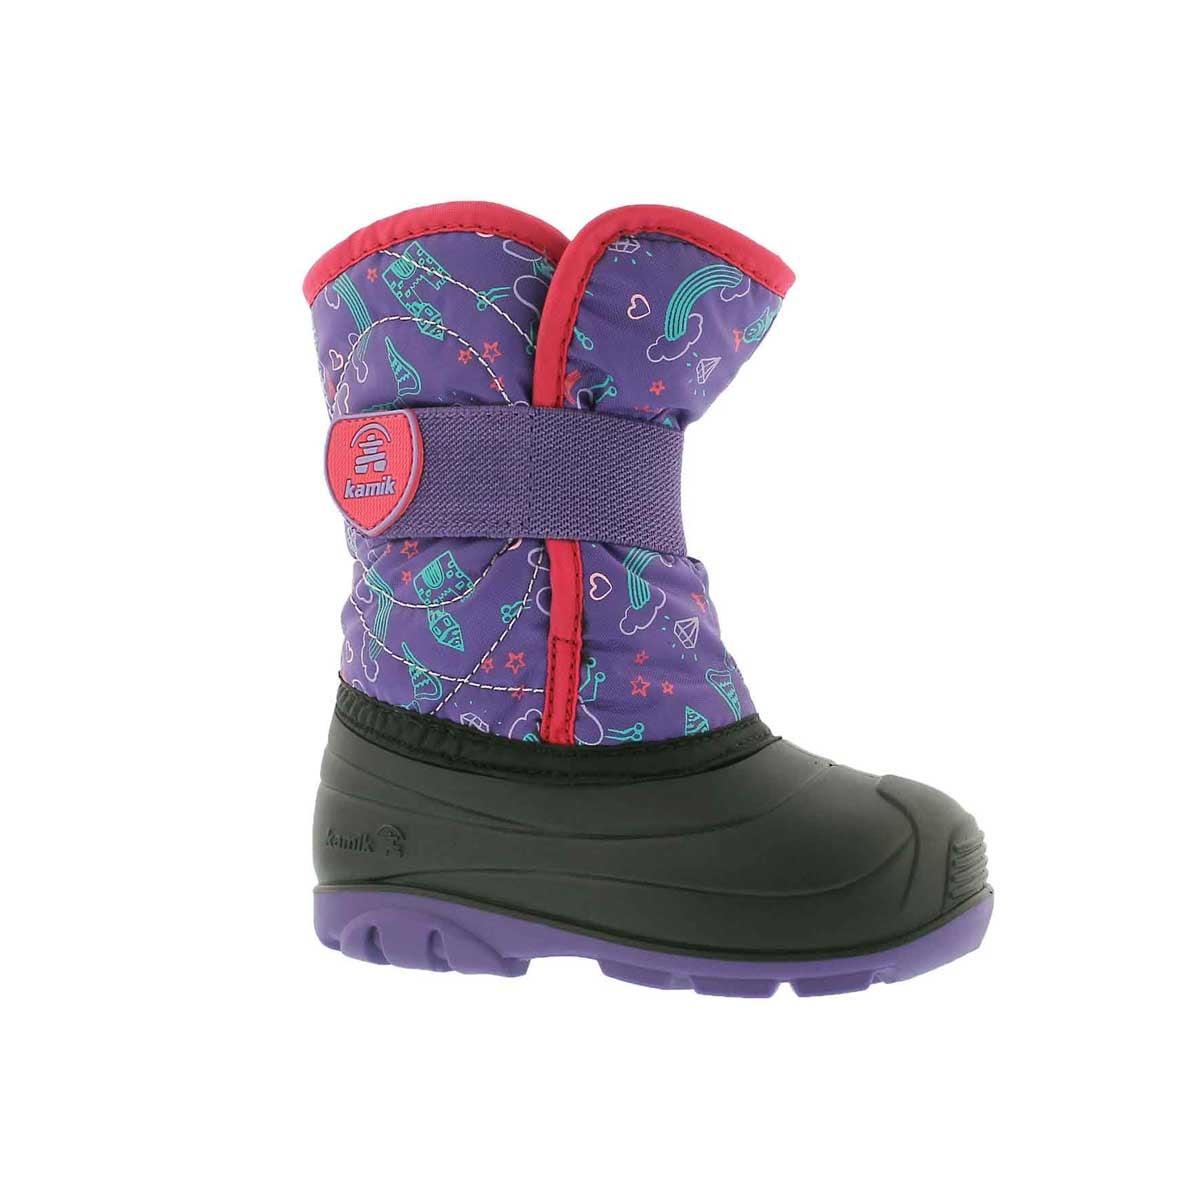 Infants' SNOWBUG 4 purple waterproof winter boots